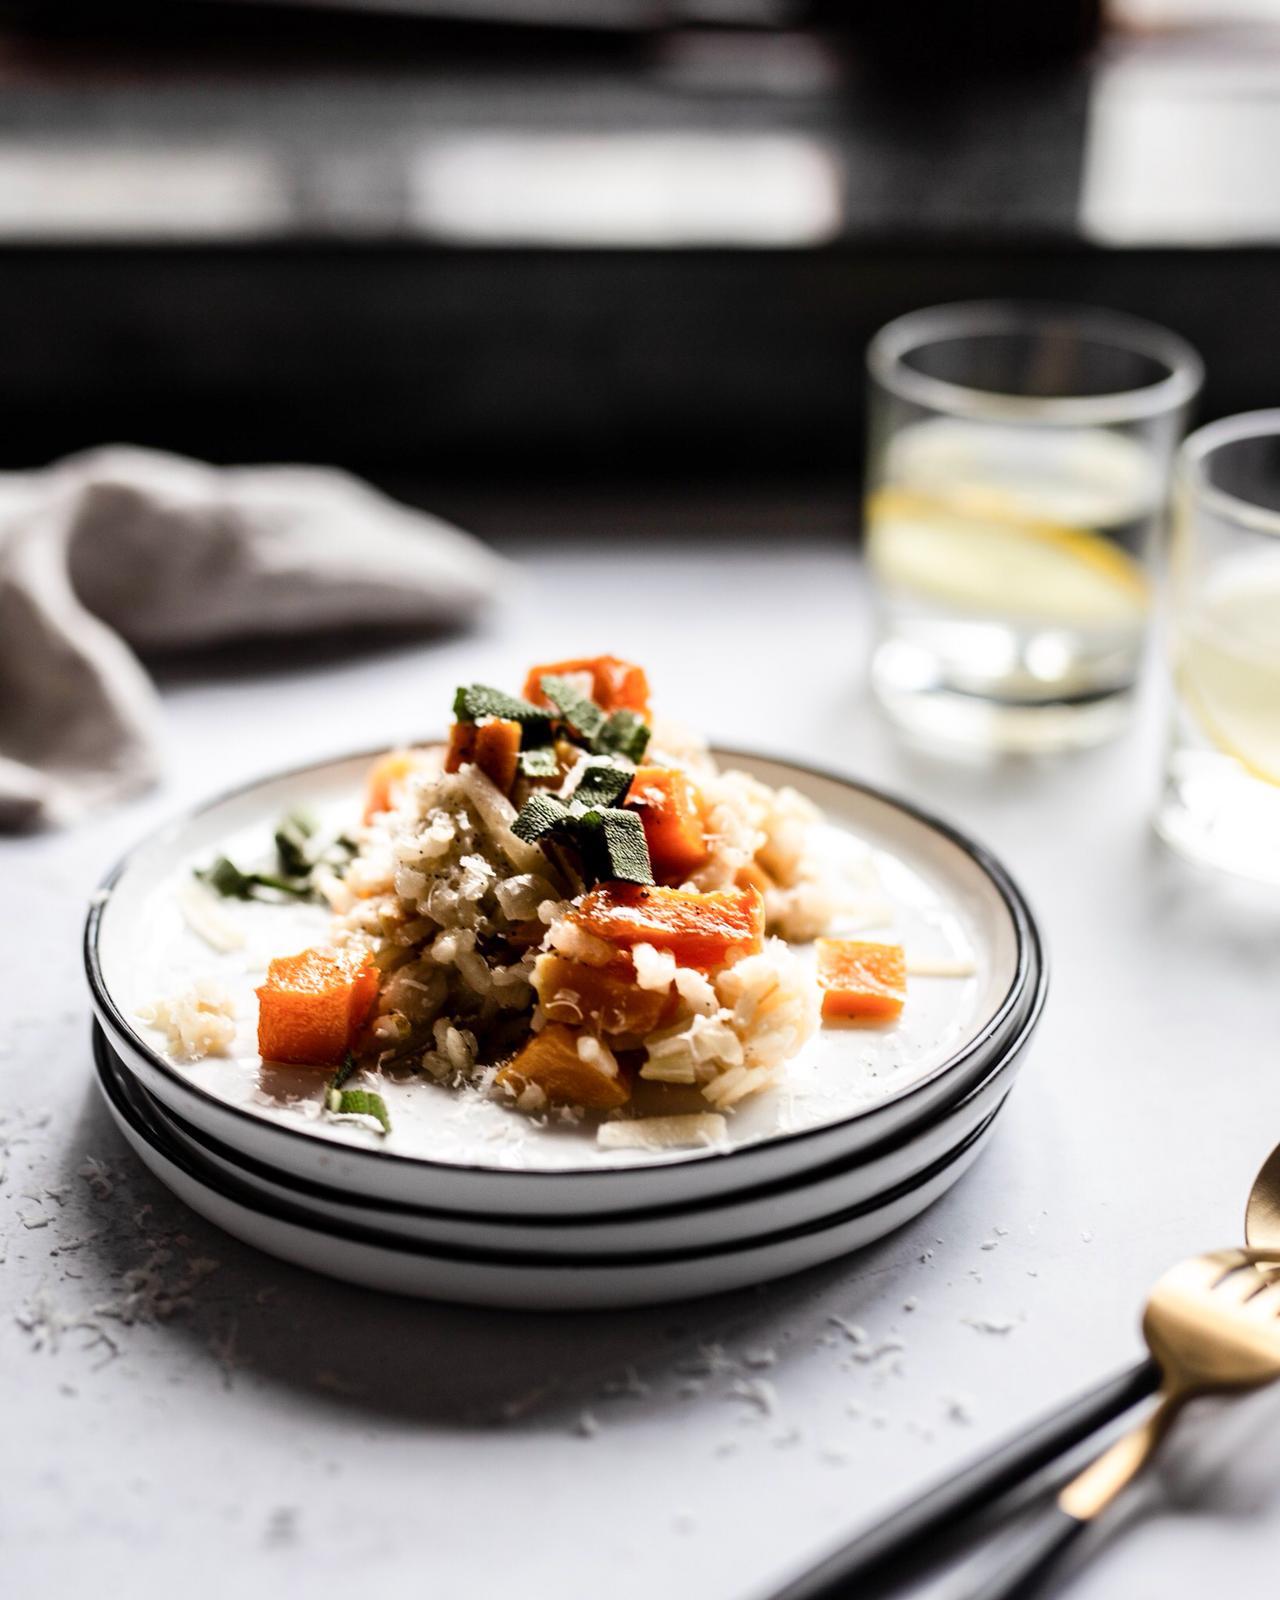 Risotto Kürbis Salbei Parmesan Foodstyling